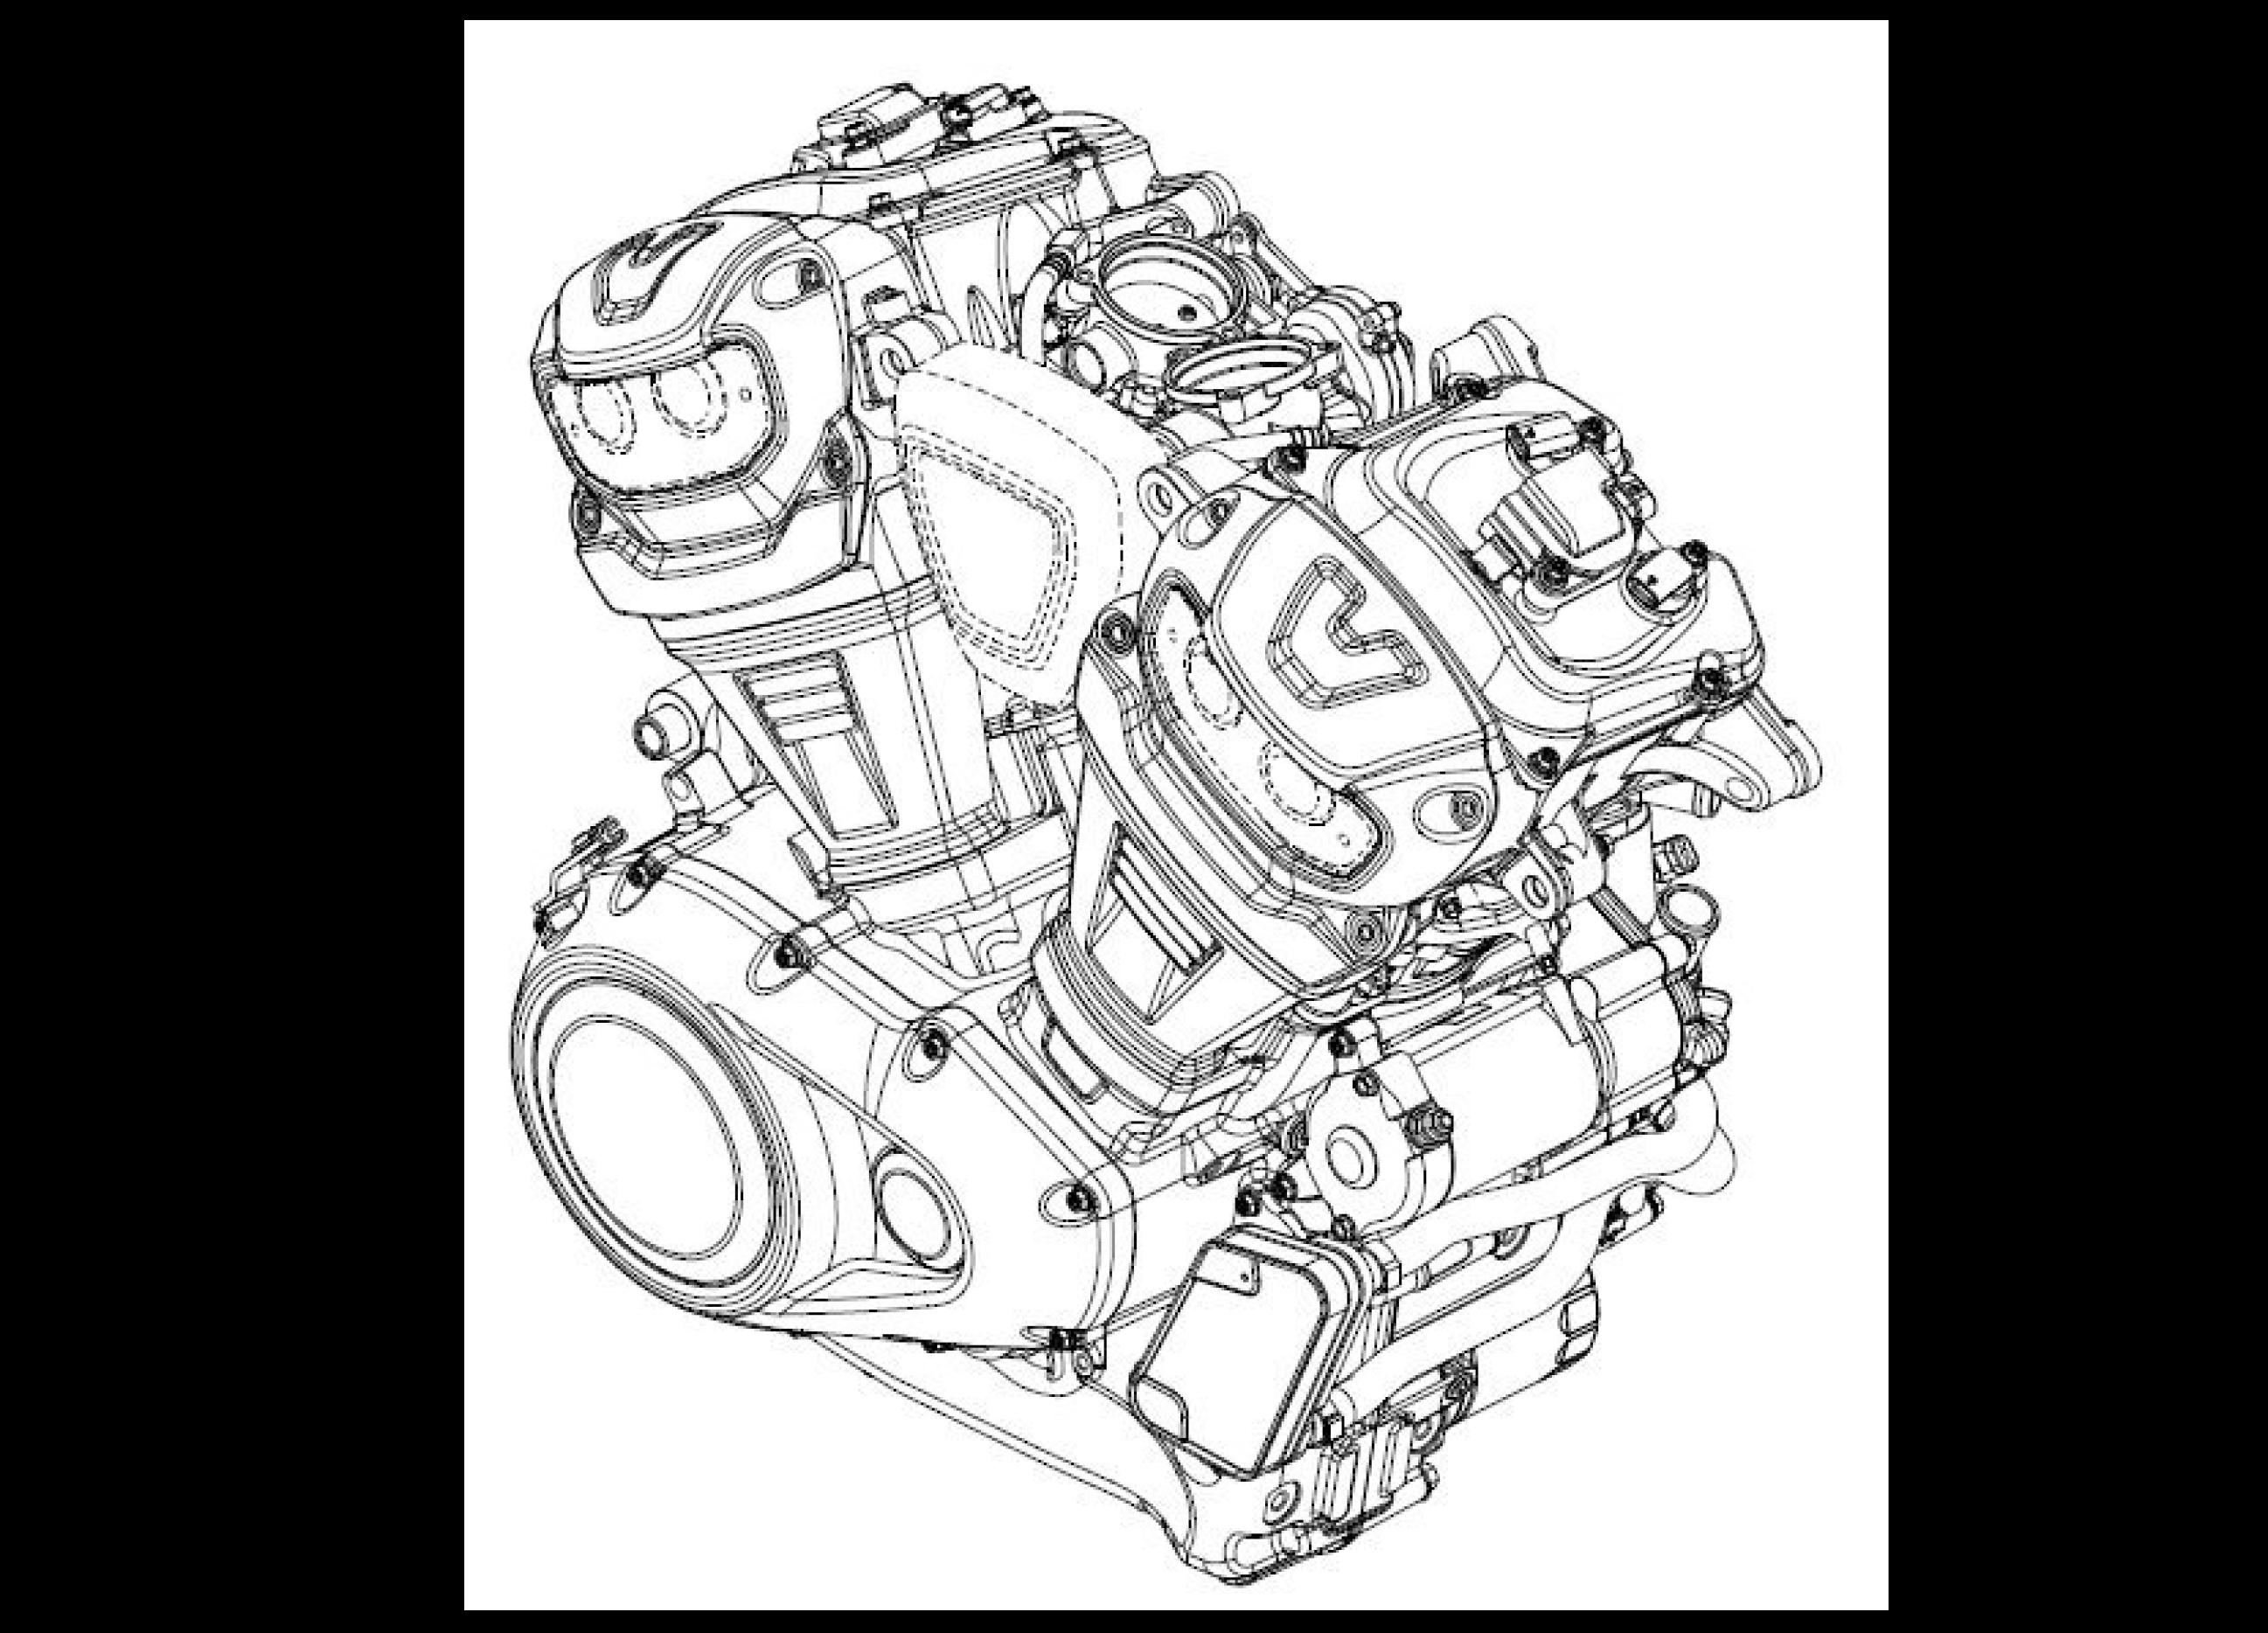 040419-harley-davidson-new-60-degree-v-twin-engine-0001-fig-1